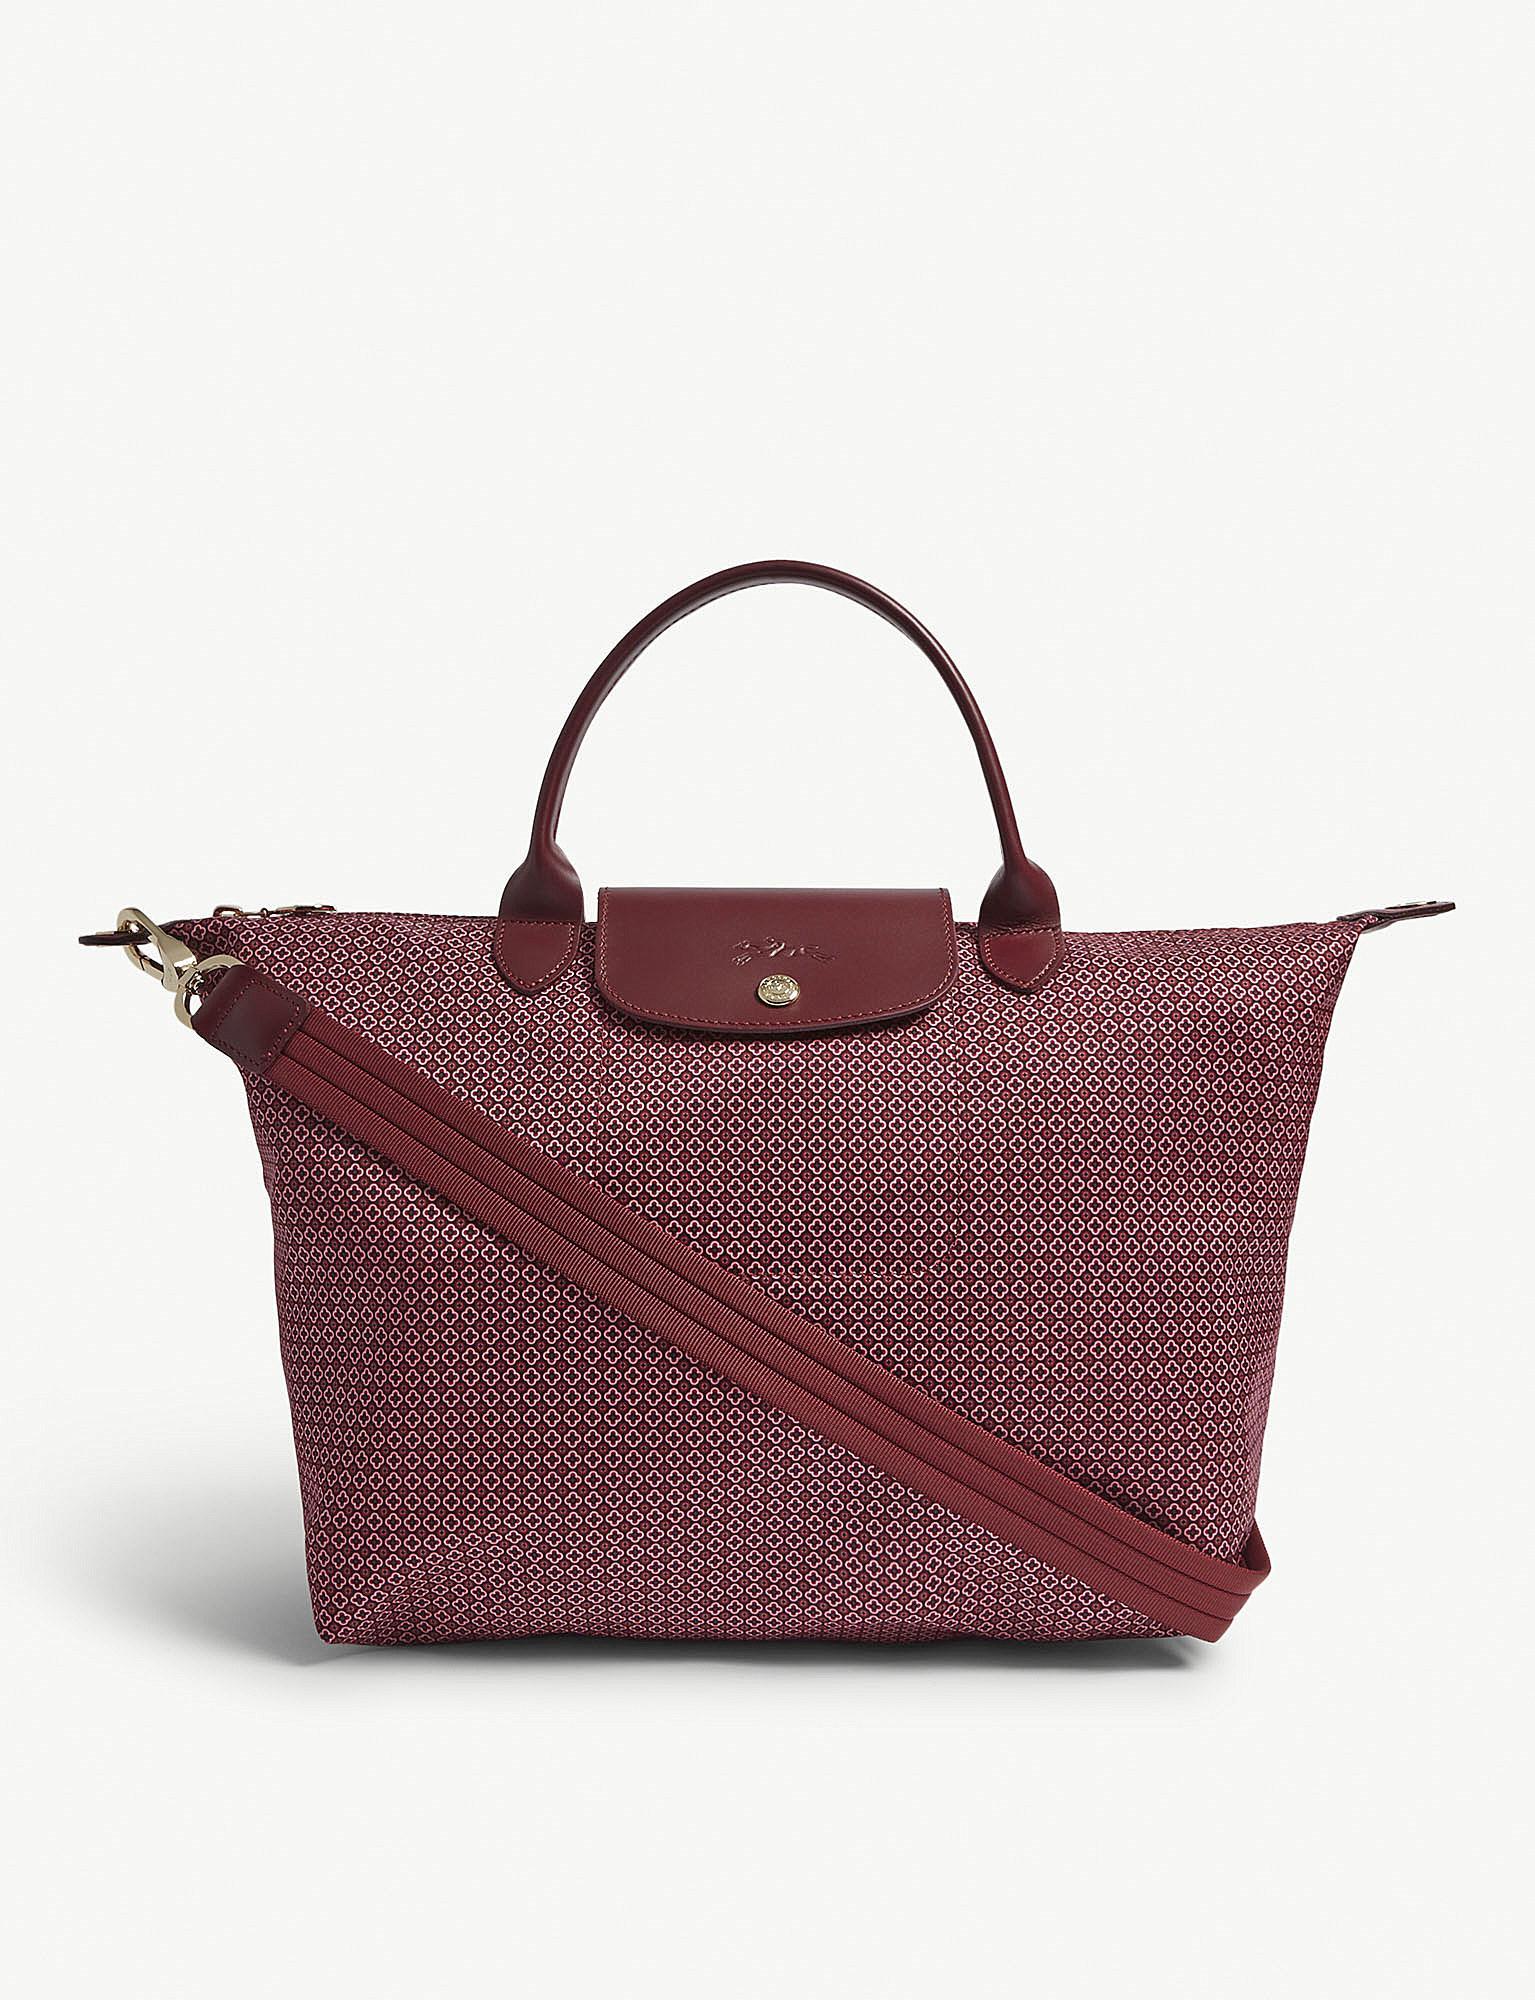 47f5f11ea9ad Longchamp Le Pliage Dandy Shoulder Bag in Red - Lyst